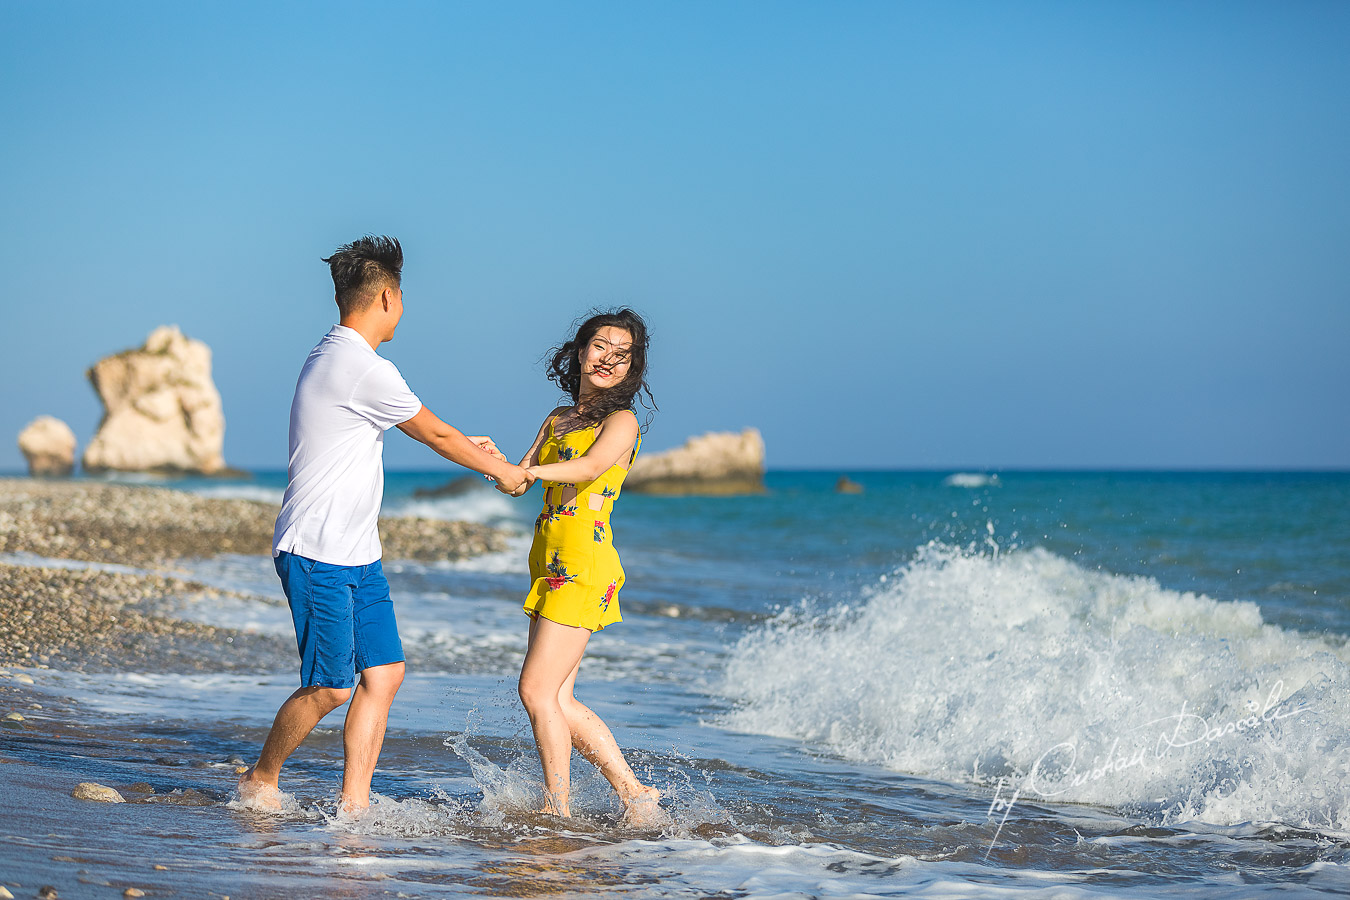 Beautiful moments captured by Cristian Dascalu at Petra Tou Romiou, Cyprus.